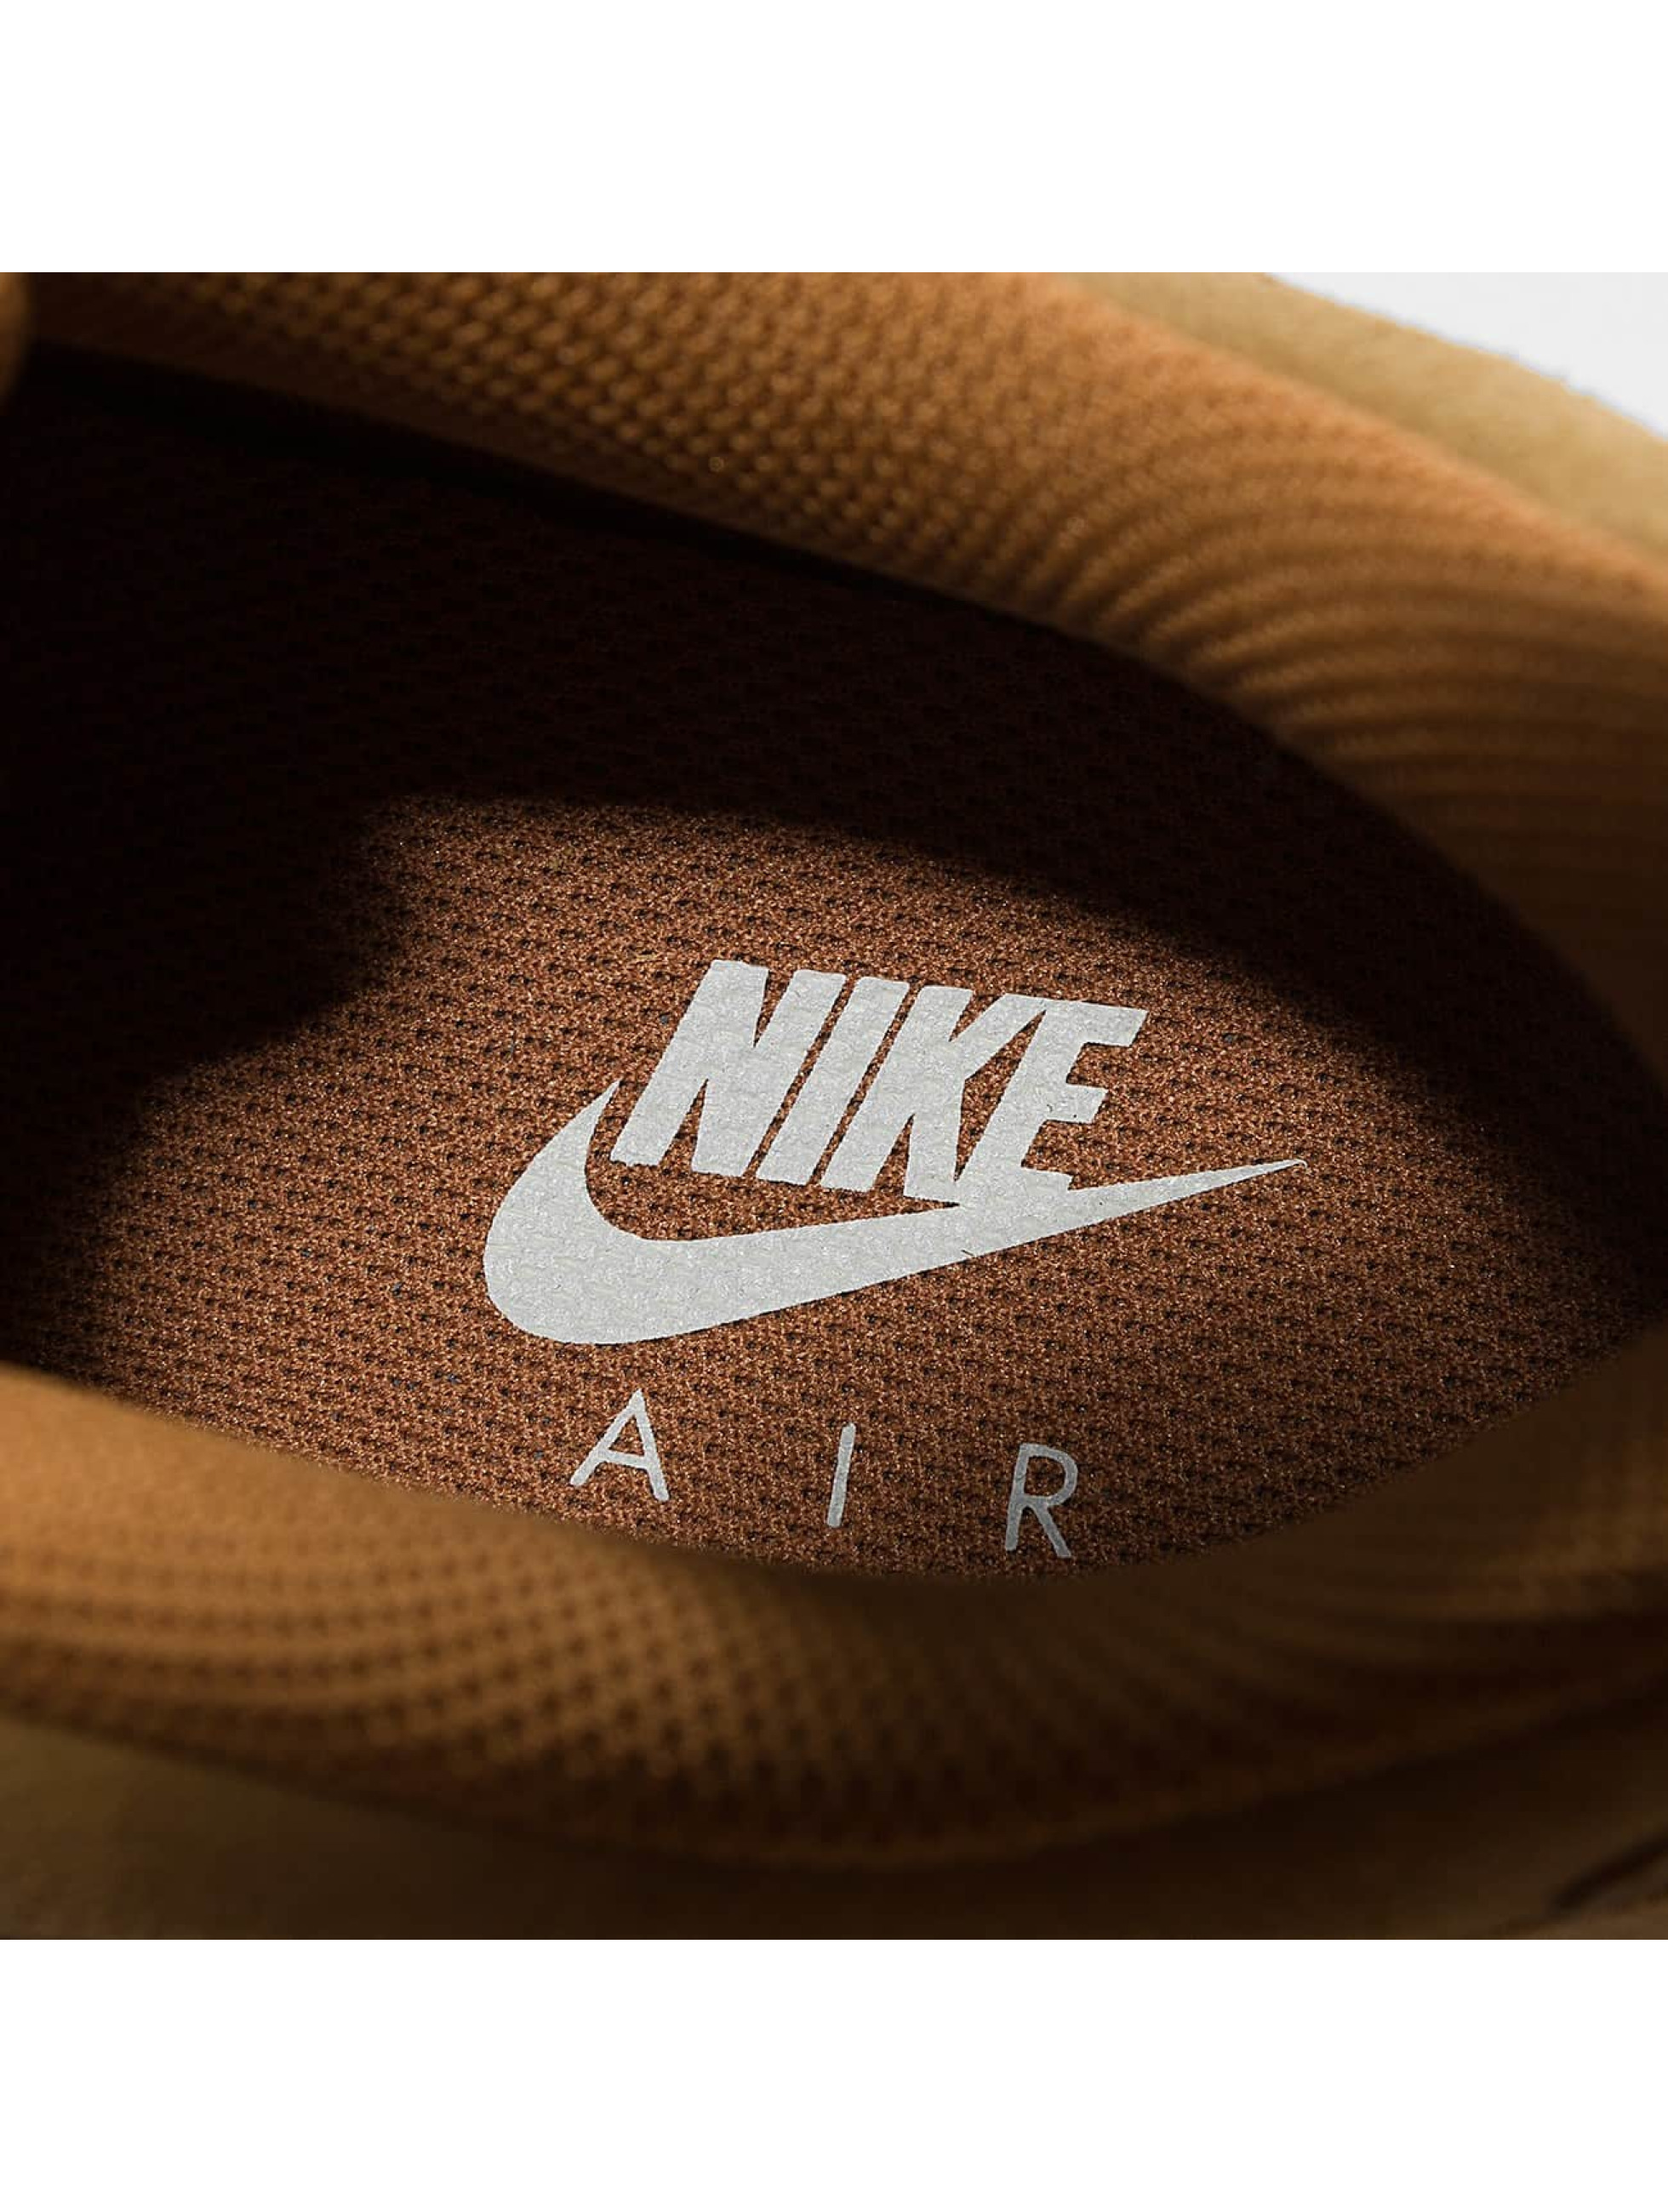 Nike Zapatillas de deporte Air Max 90 Ultra 2.0 LTR marrón